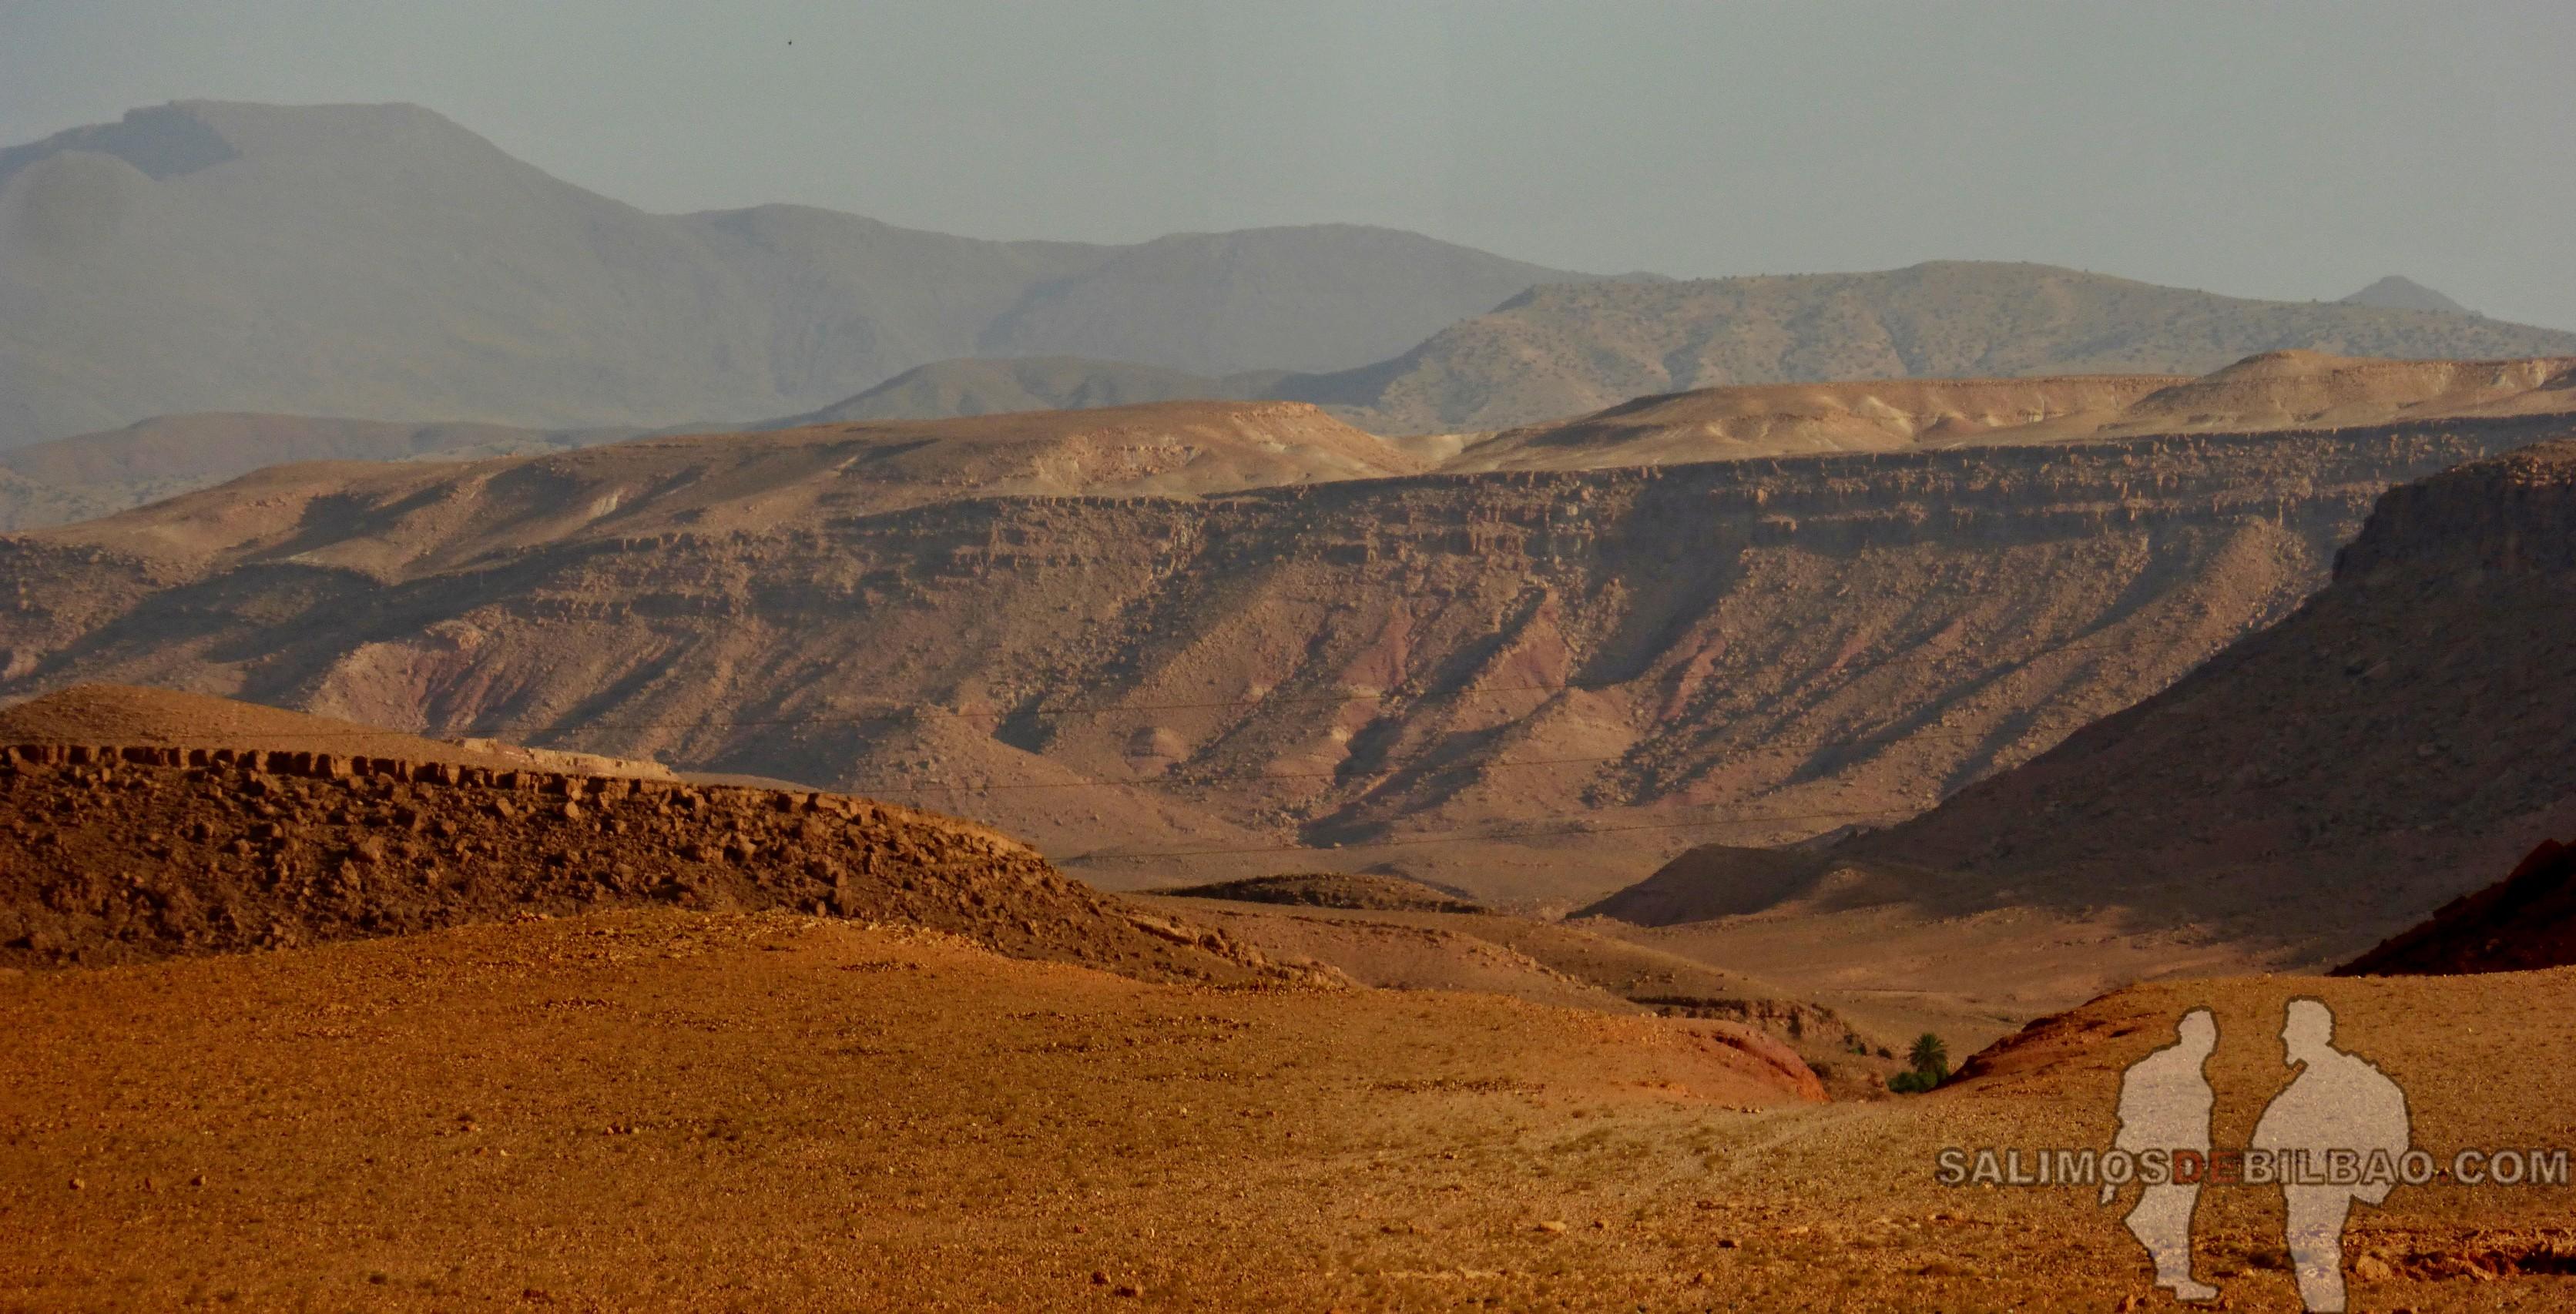 621. Pano, Rodeando el Kasbah Ait Ben Haddou